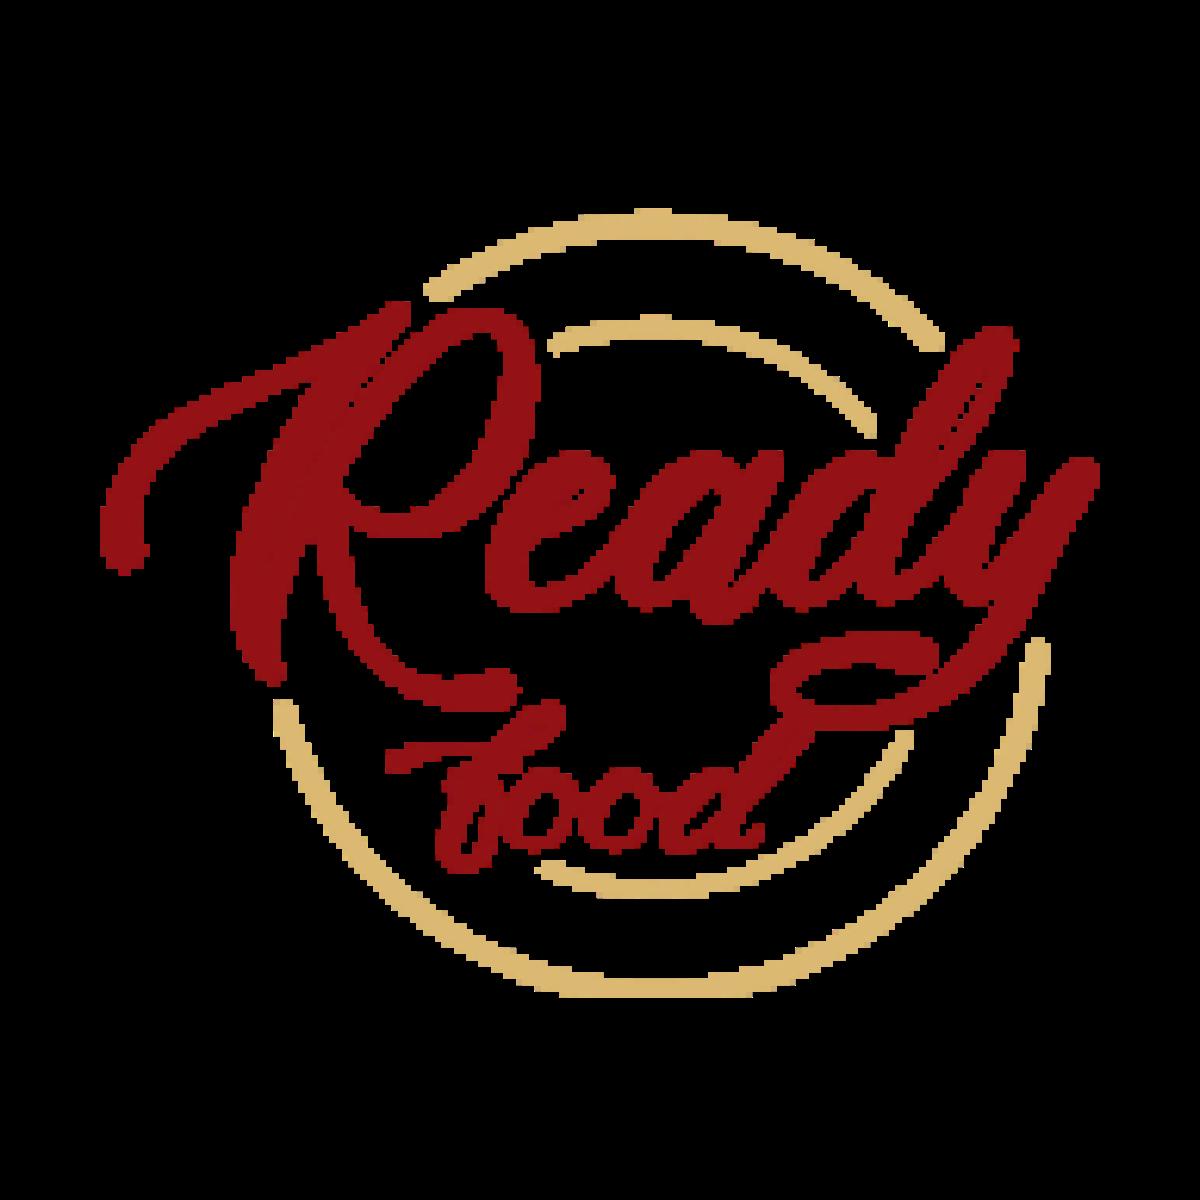 Readyfood